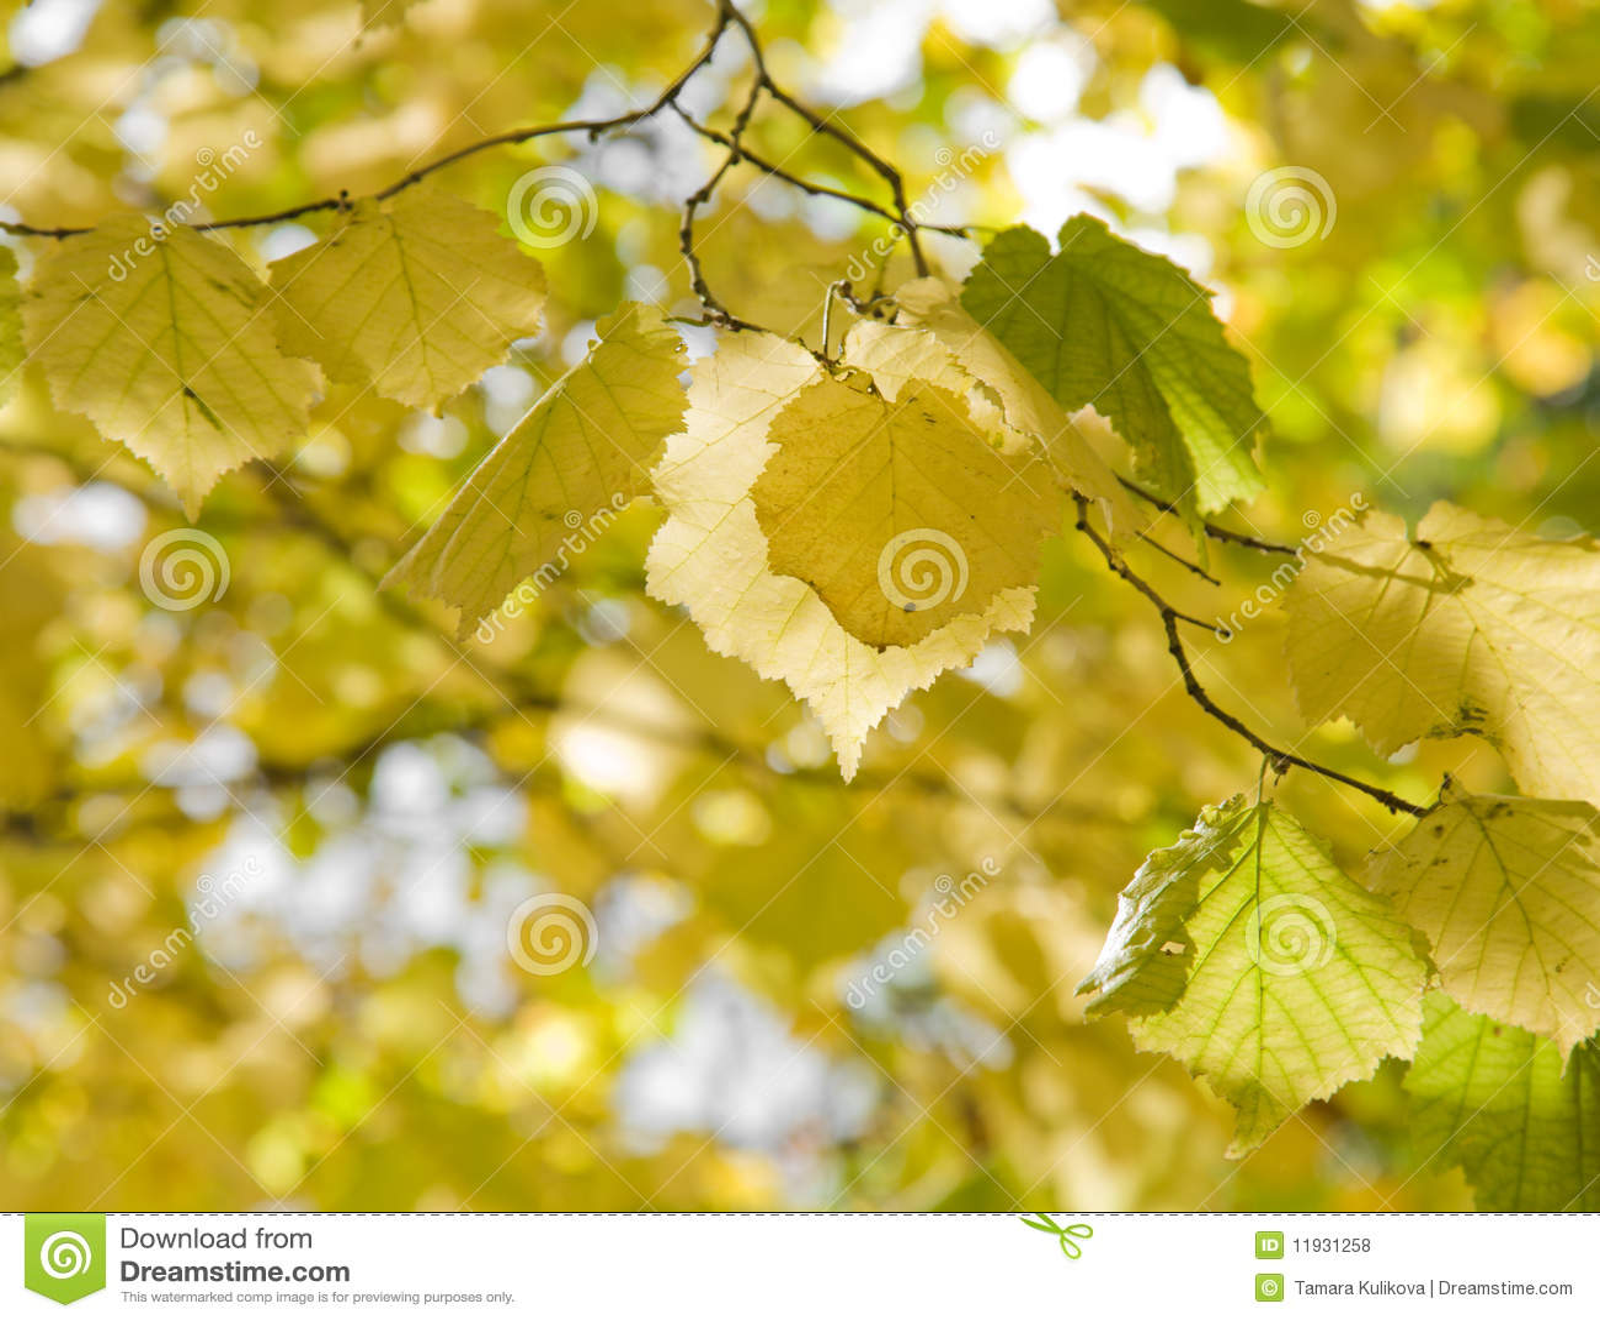 Hazels (Corylus); autumn foliage